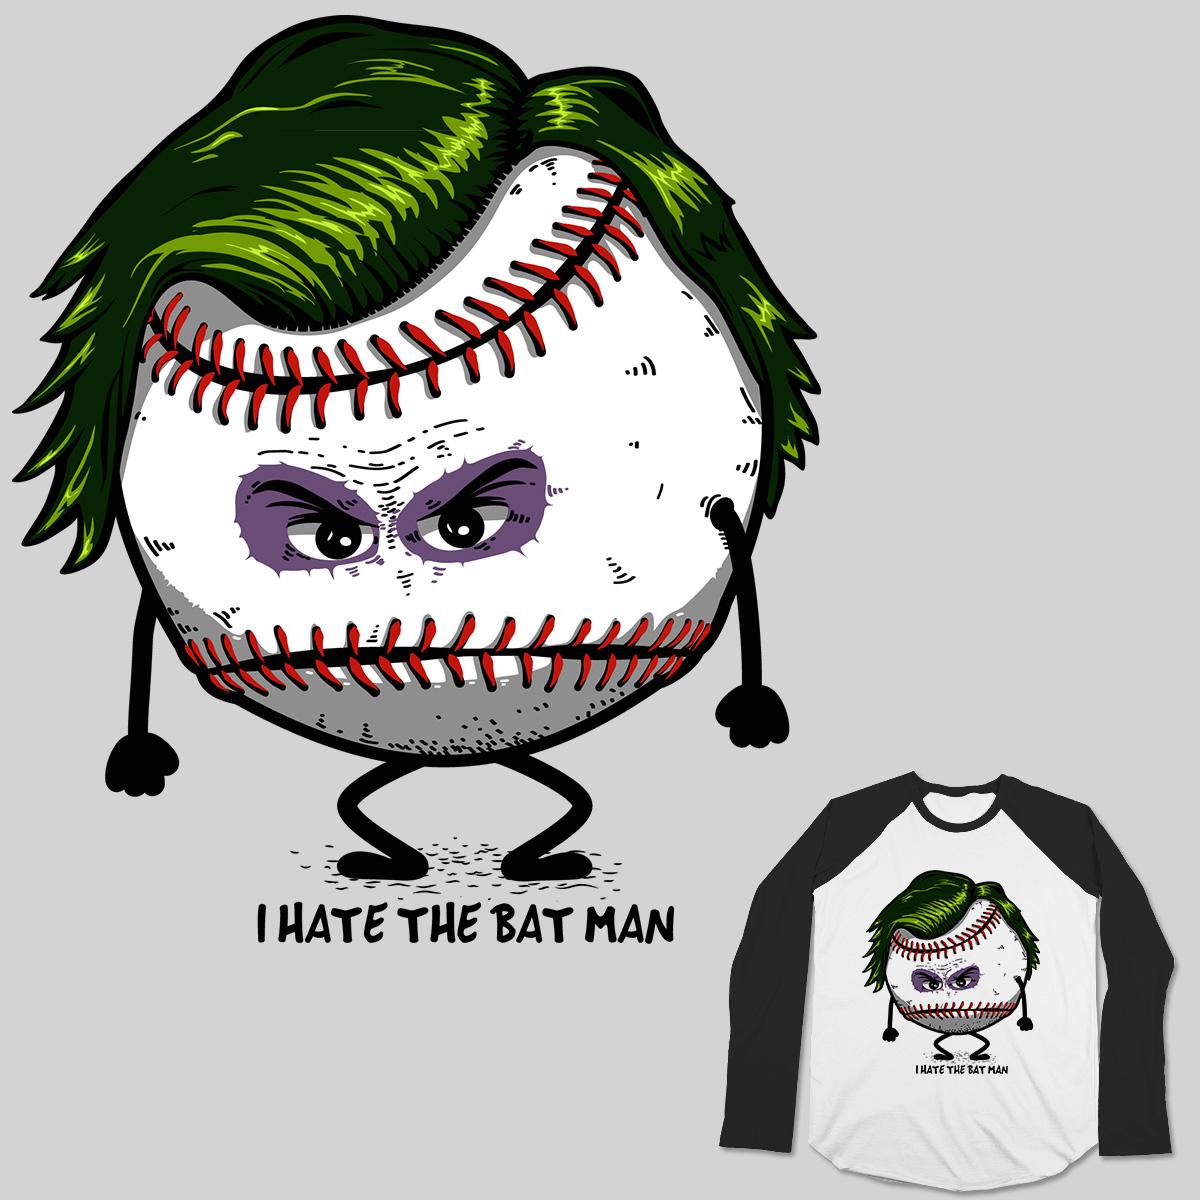 Joker vs Bat man by Theduc on Threadless